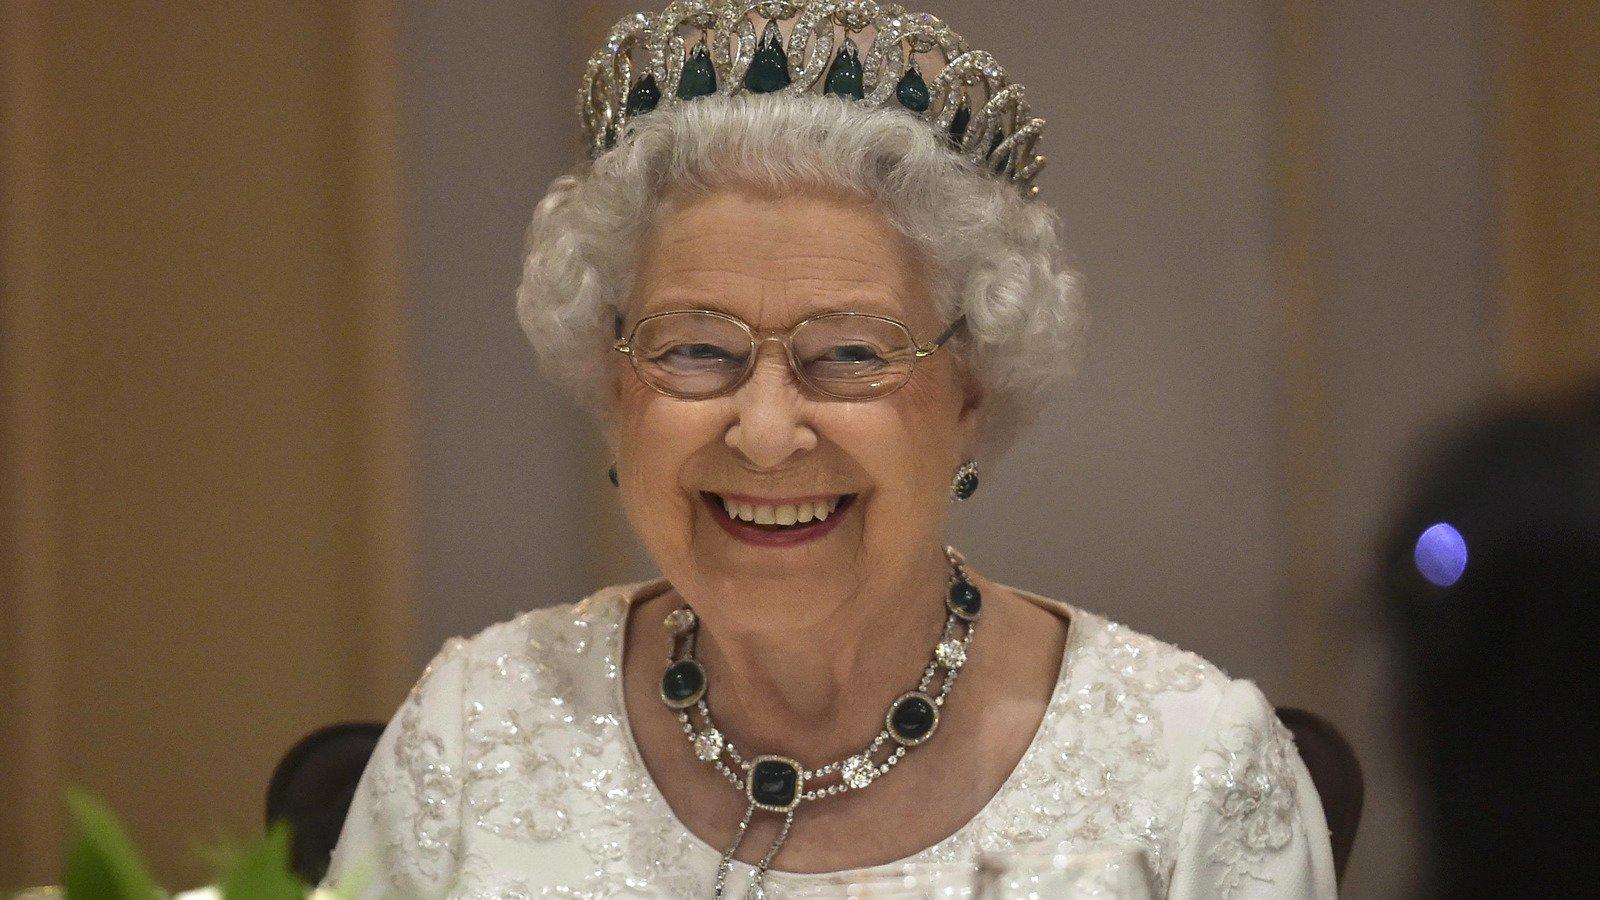 Queen Elizabeth II Refuses To Eat This Spice